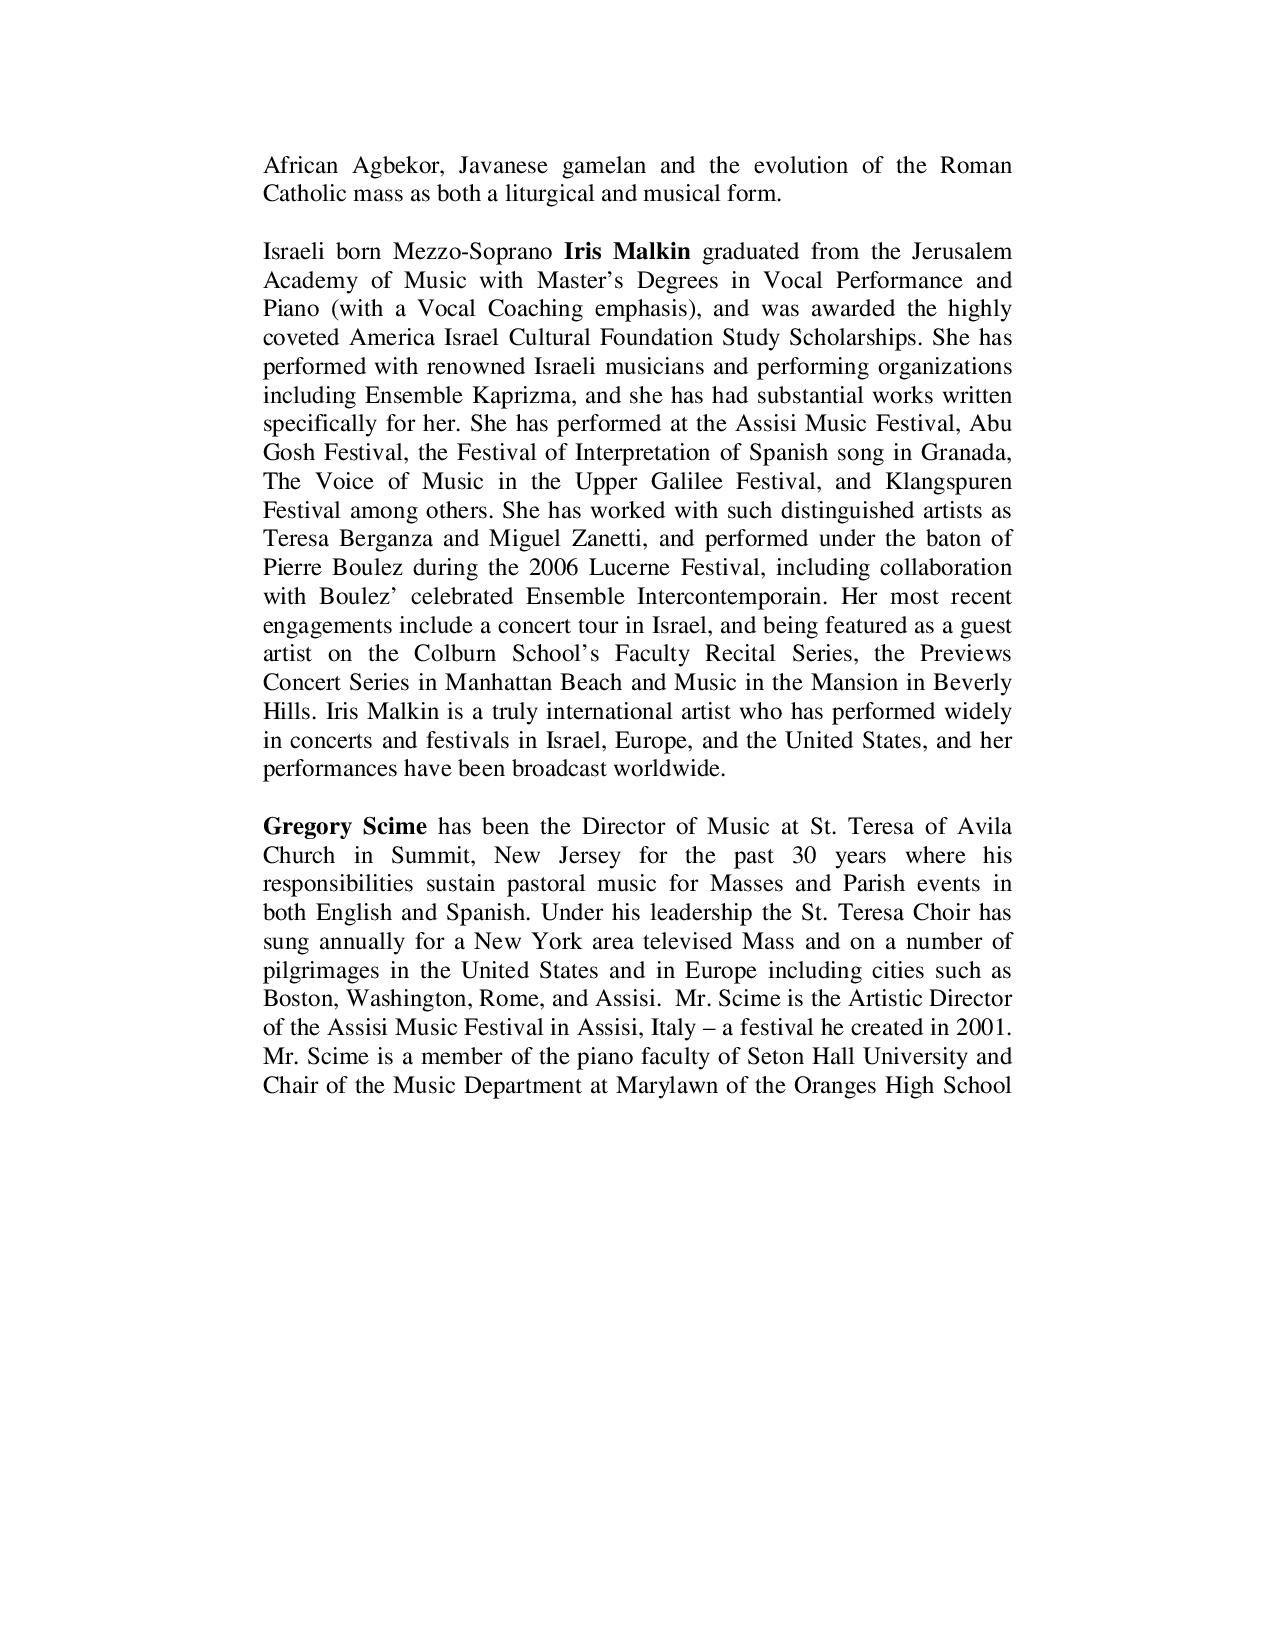 2009-04-26 - Program for Printing-page-008.jpg